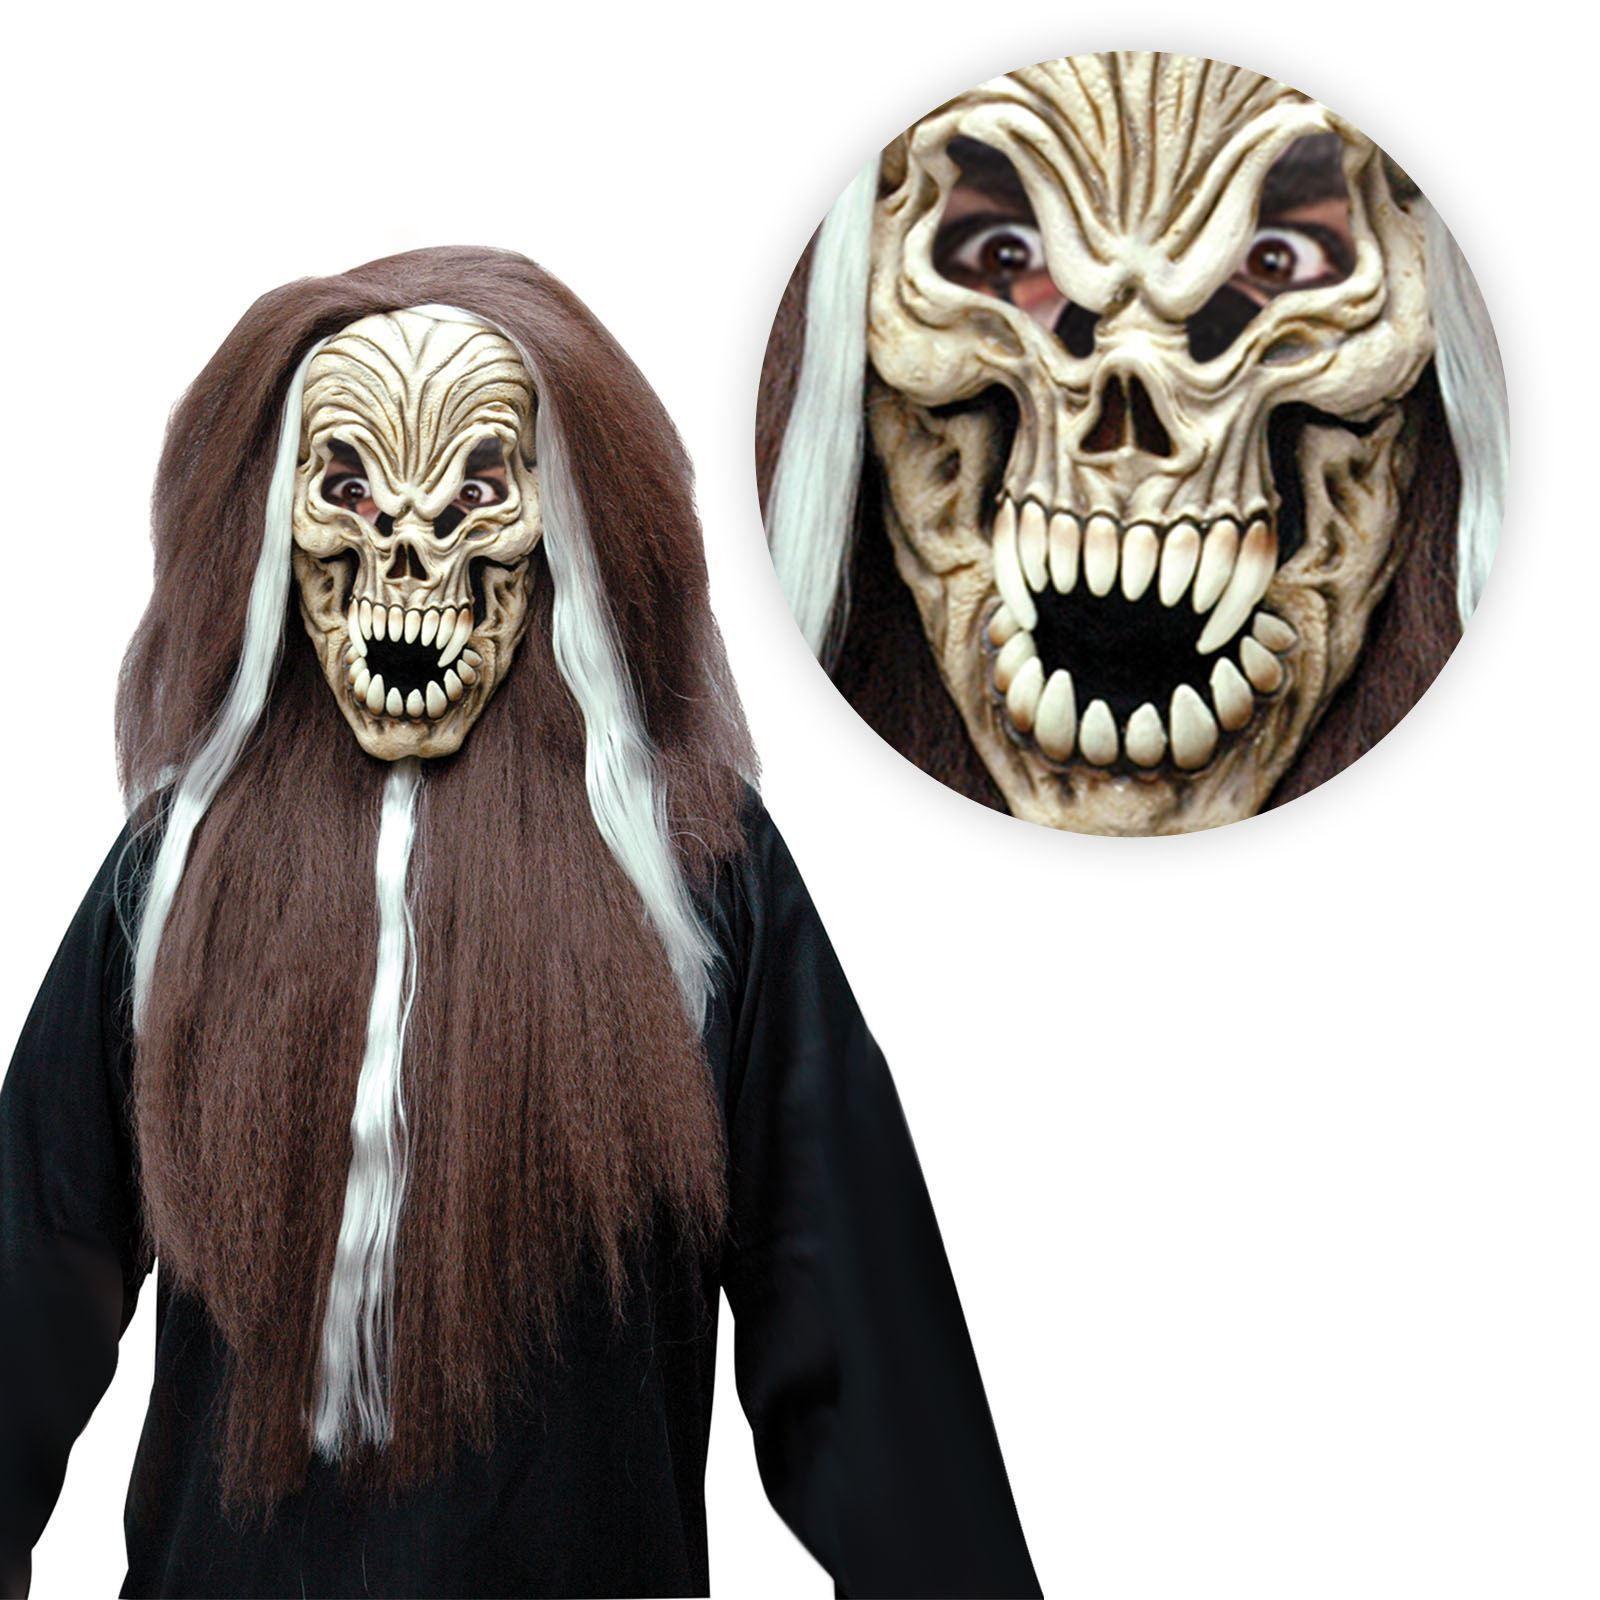 Details about Long Hair Skull Reaper Demon Mask Zombie Horror ...